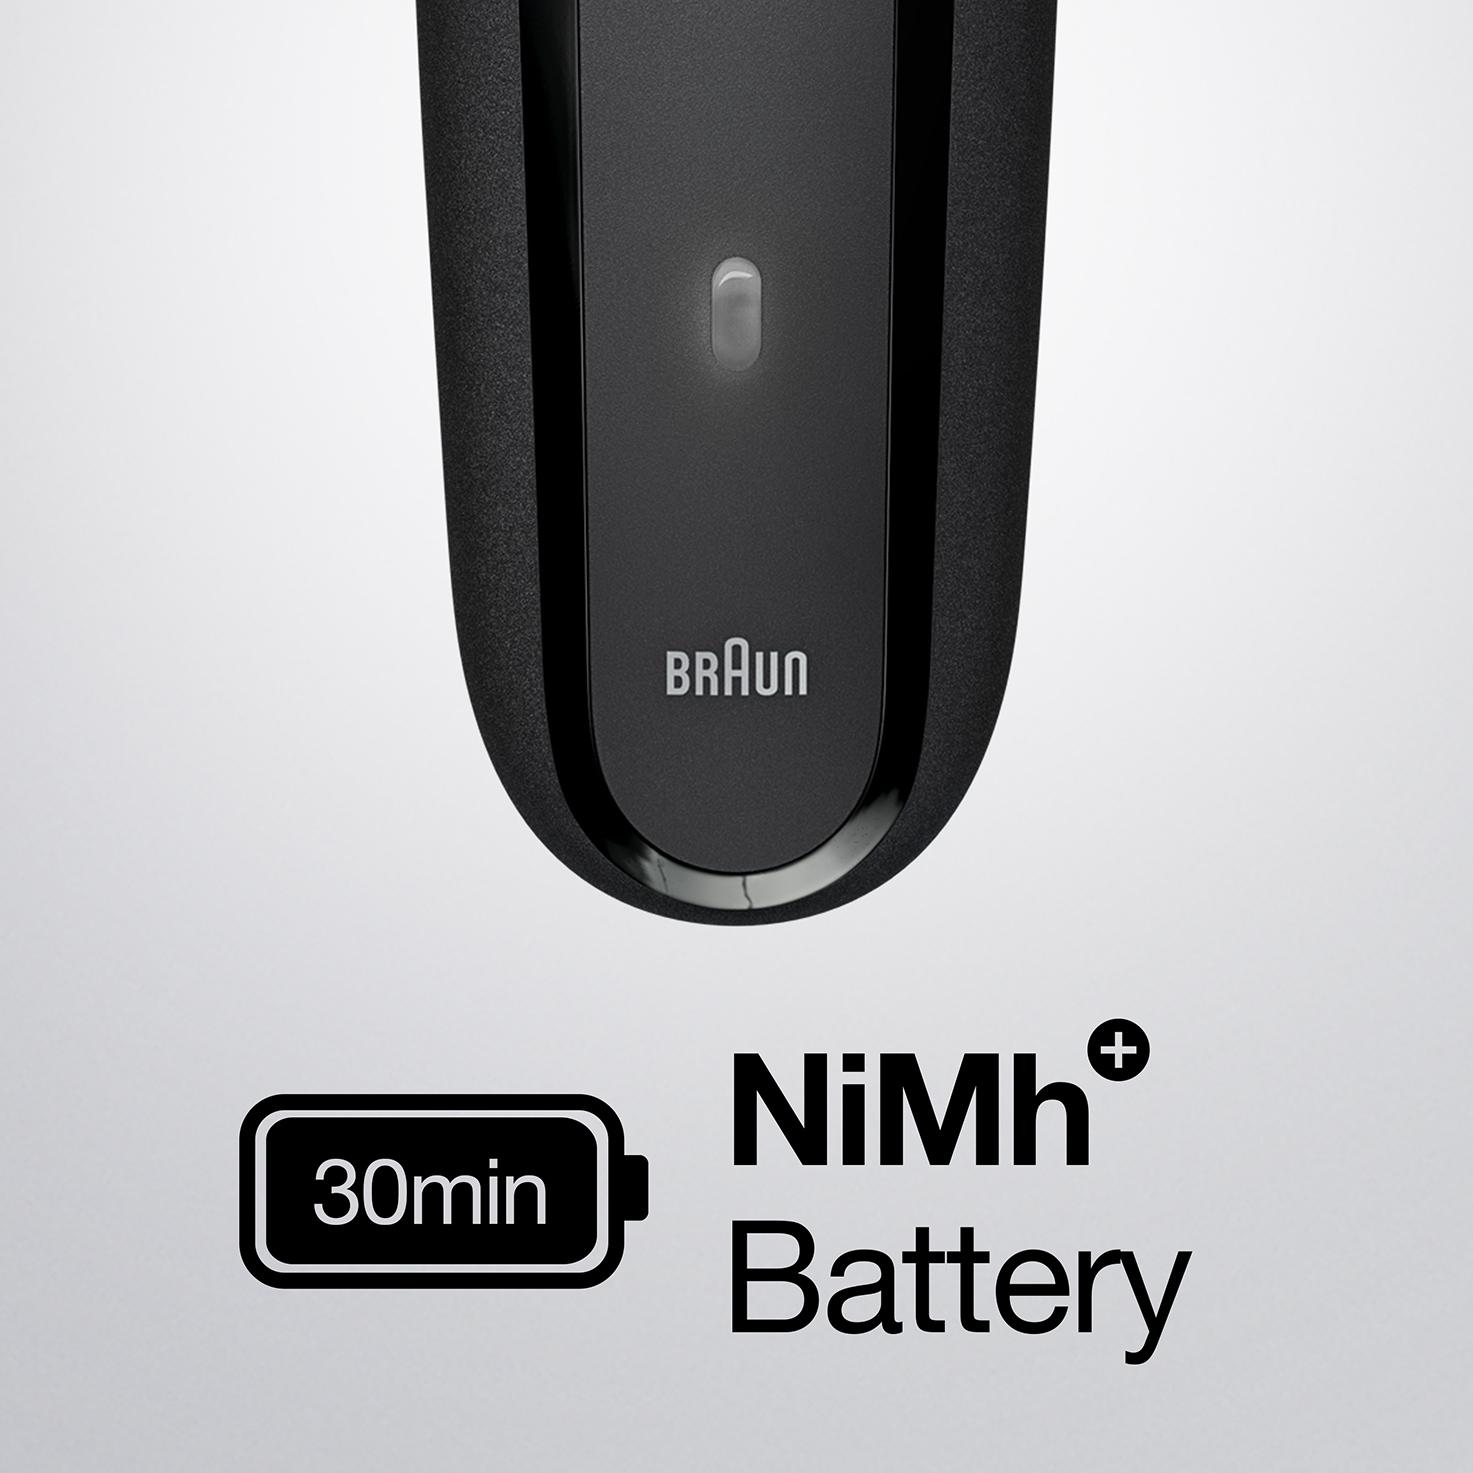 Tölthető Ni-Mh akkumulátor